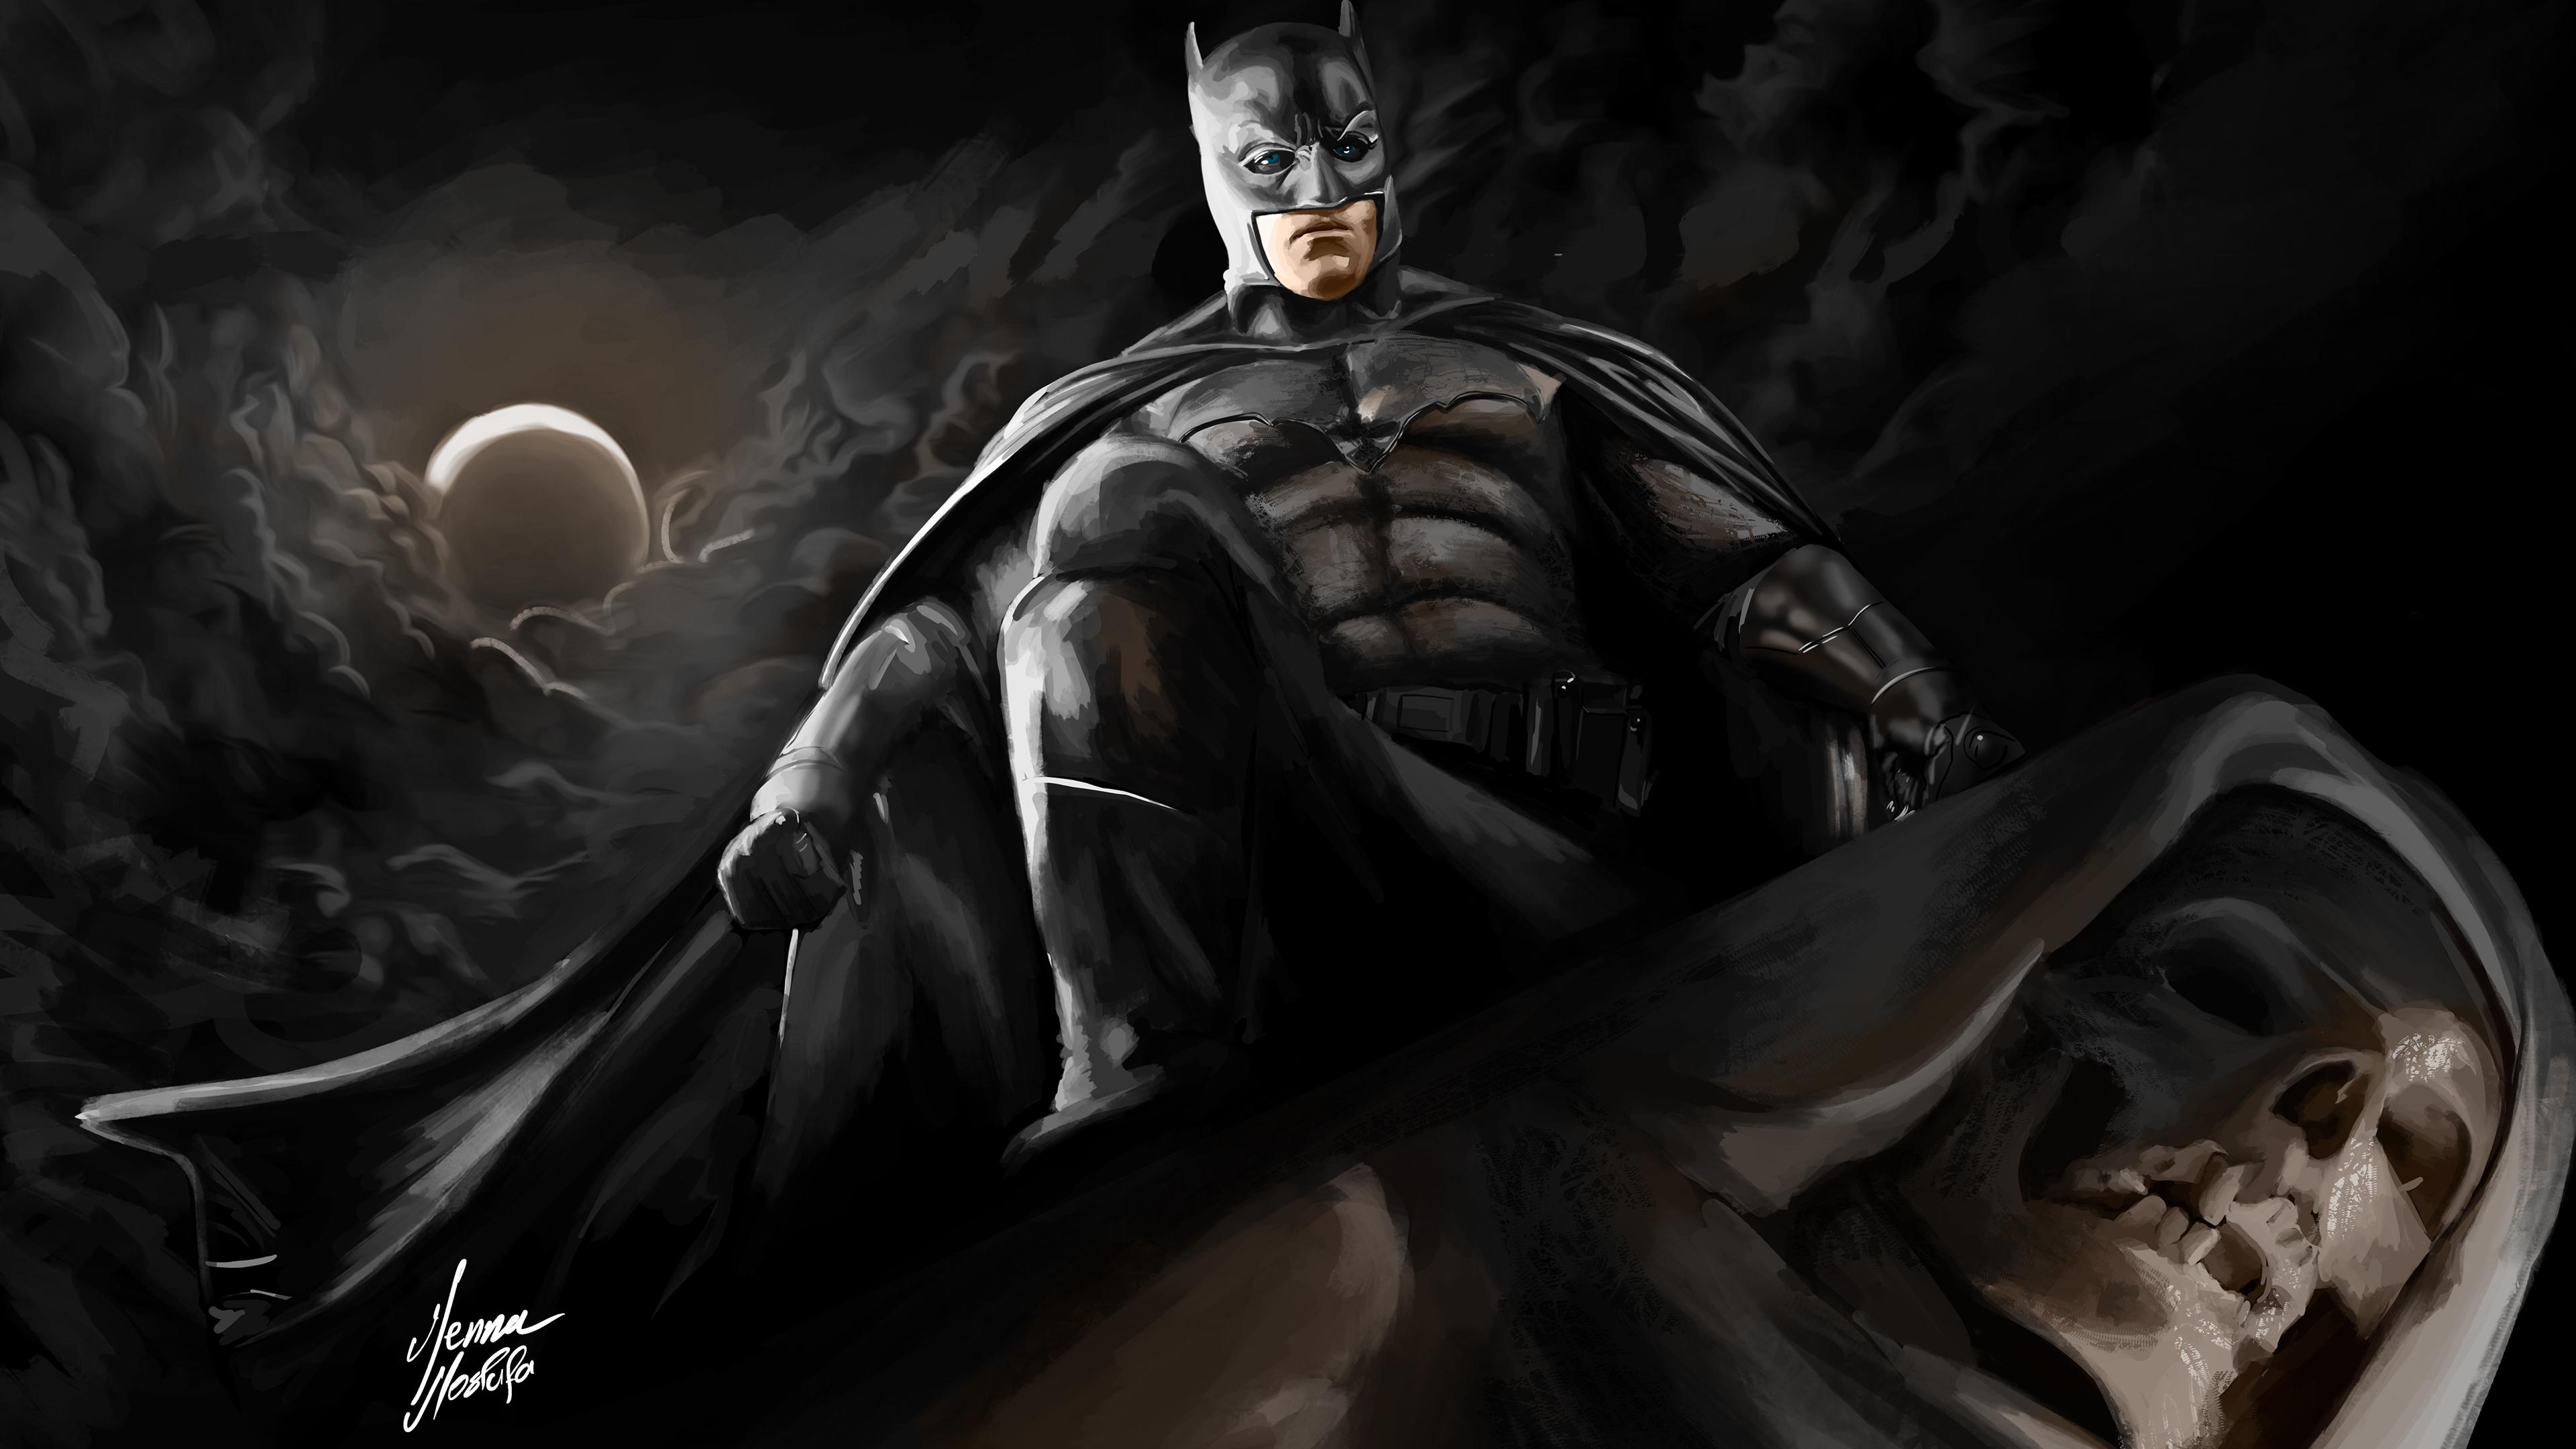 batman darknight art 1572367744 - Batman Darknight Art - superheroes wallpapers, hd-wallpapers, digital art wallpapers, batman wallpapers, artwork wallpapers, 4k-wallpapers